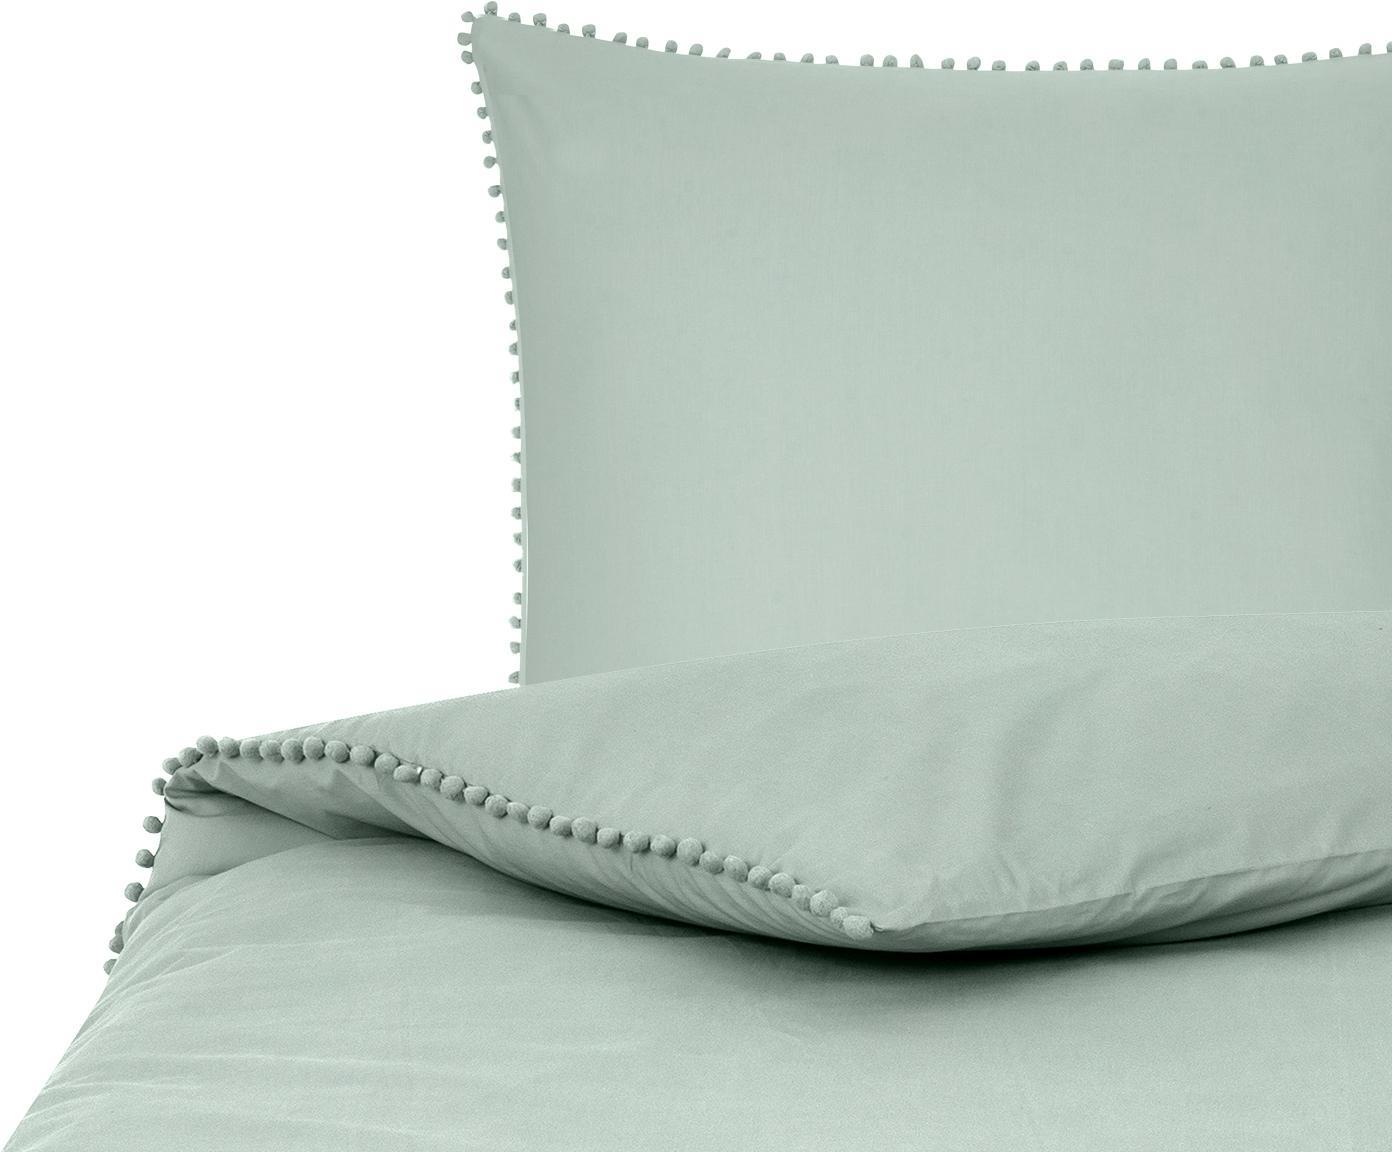 Baumwollperkal-Bettwäsche Bommy mit Pompoms, Webart: Perkal Fadendichte 200 TC, Salbeigrün, 135 x 200 cm + 1 Kissen 80 x 80 cm